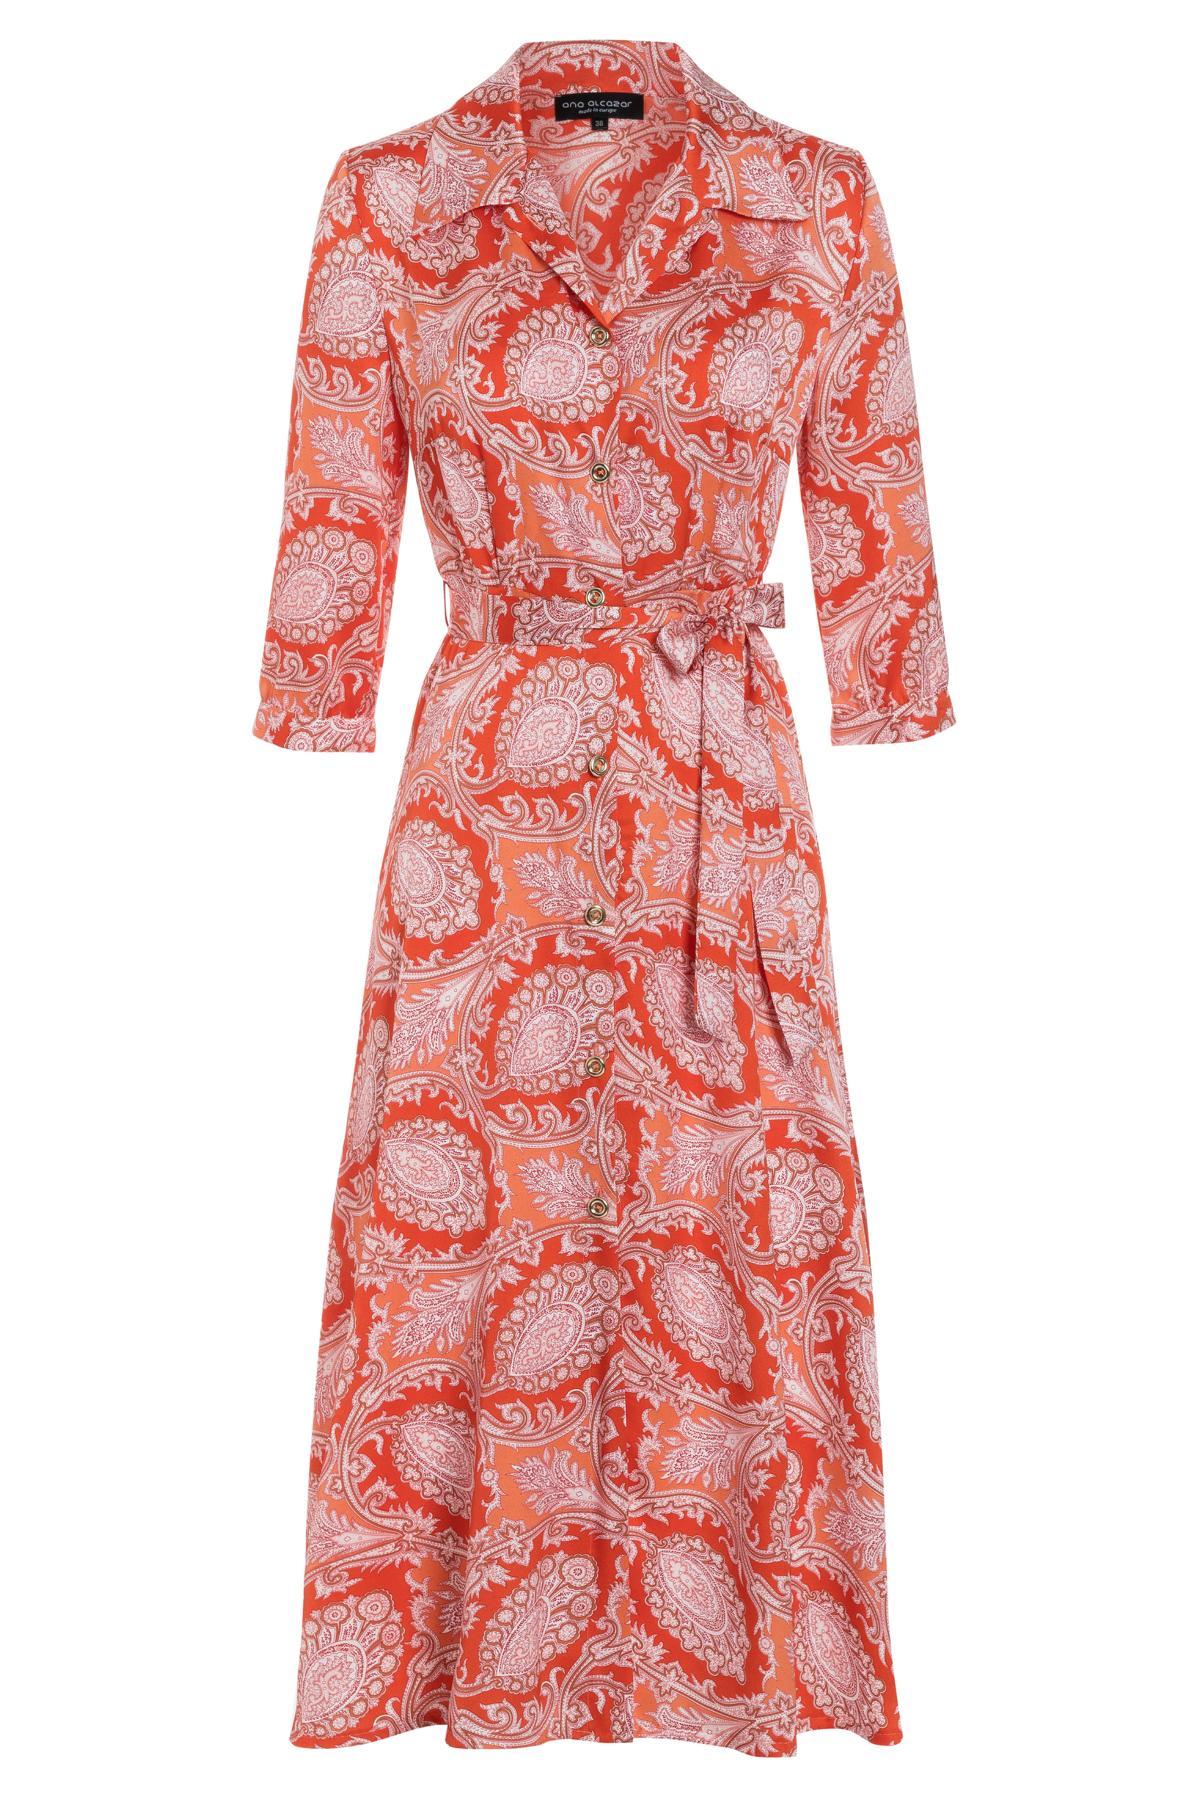 Ana Alcazar Midi Kleid Tefrole Rot